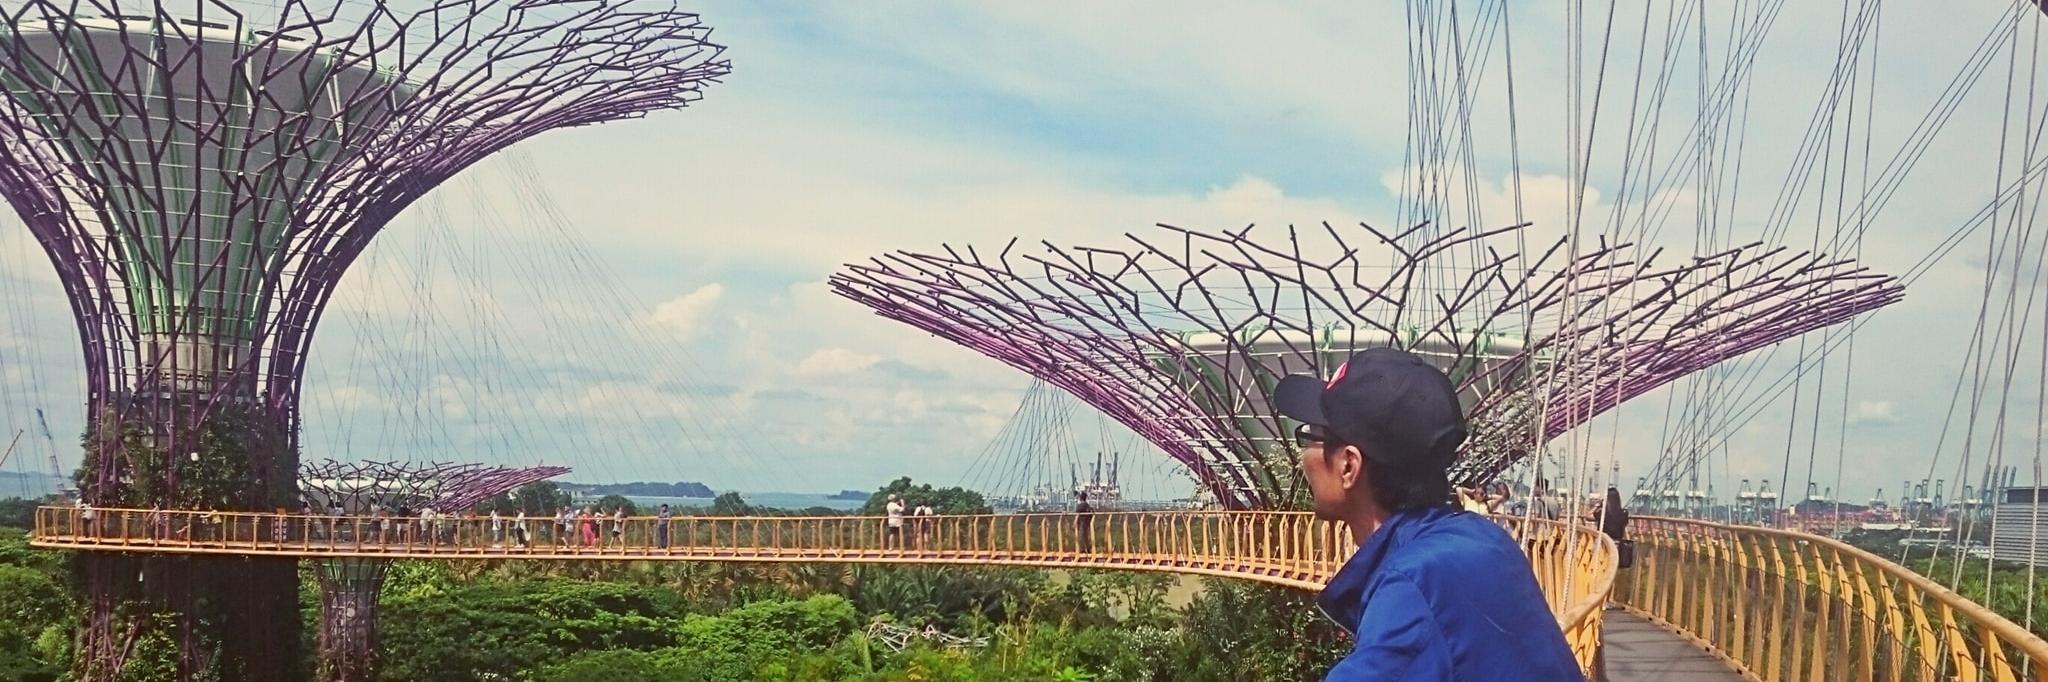 https://gody.vn/blog/trhgvhung.fa1924/post/lich-trinh-chi-tiet-cho-hanh-trinh-lang-thang-malaysia-singapore-trong-5-ngay-52018-338